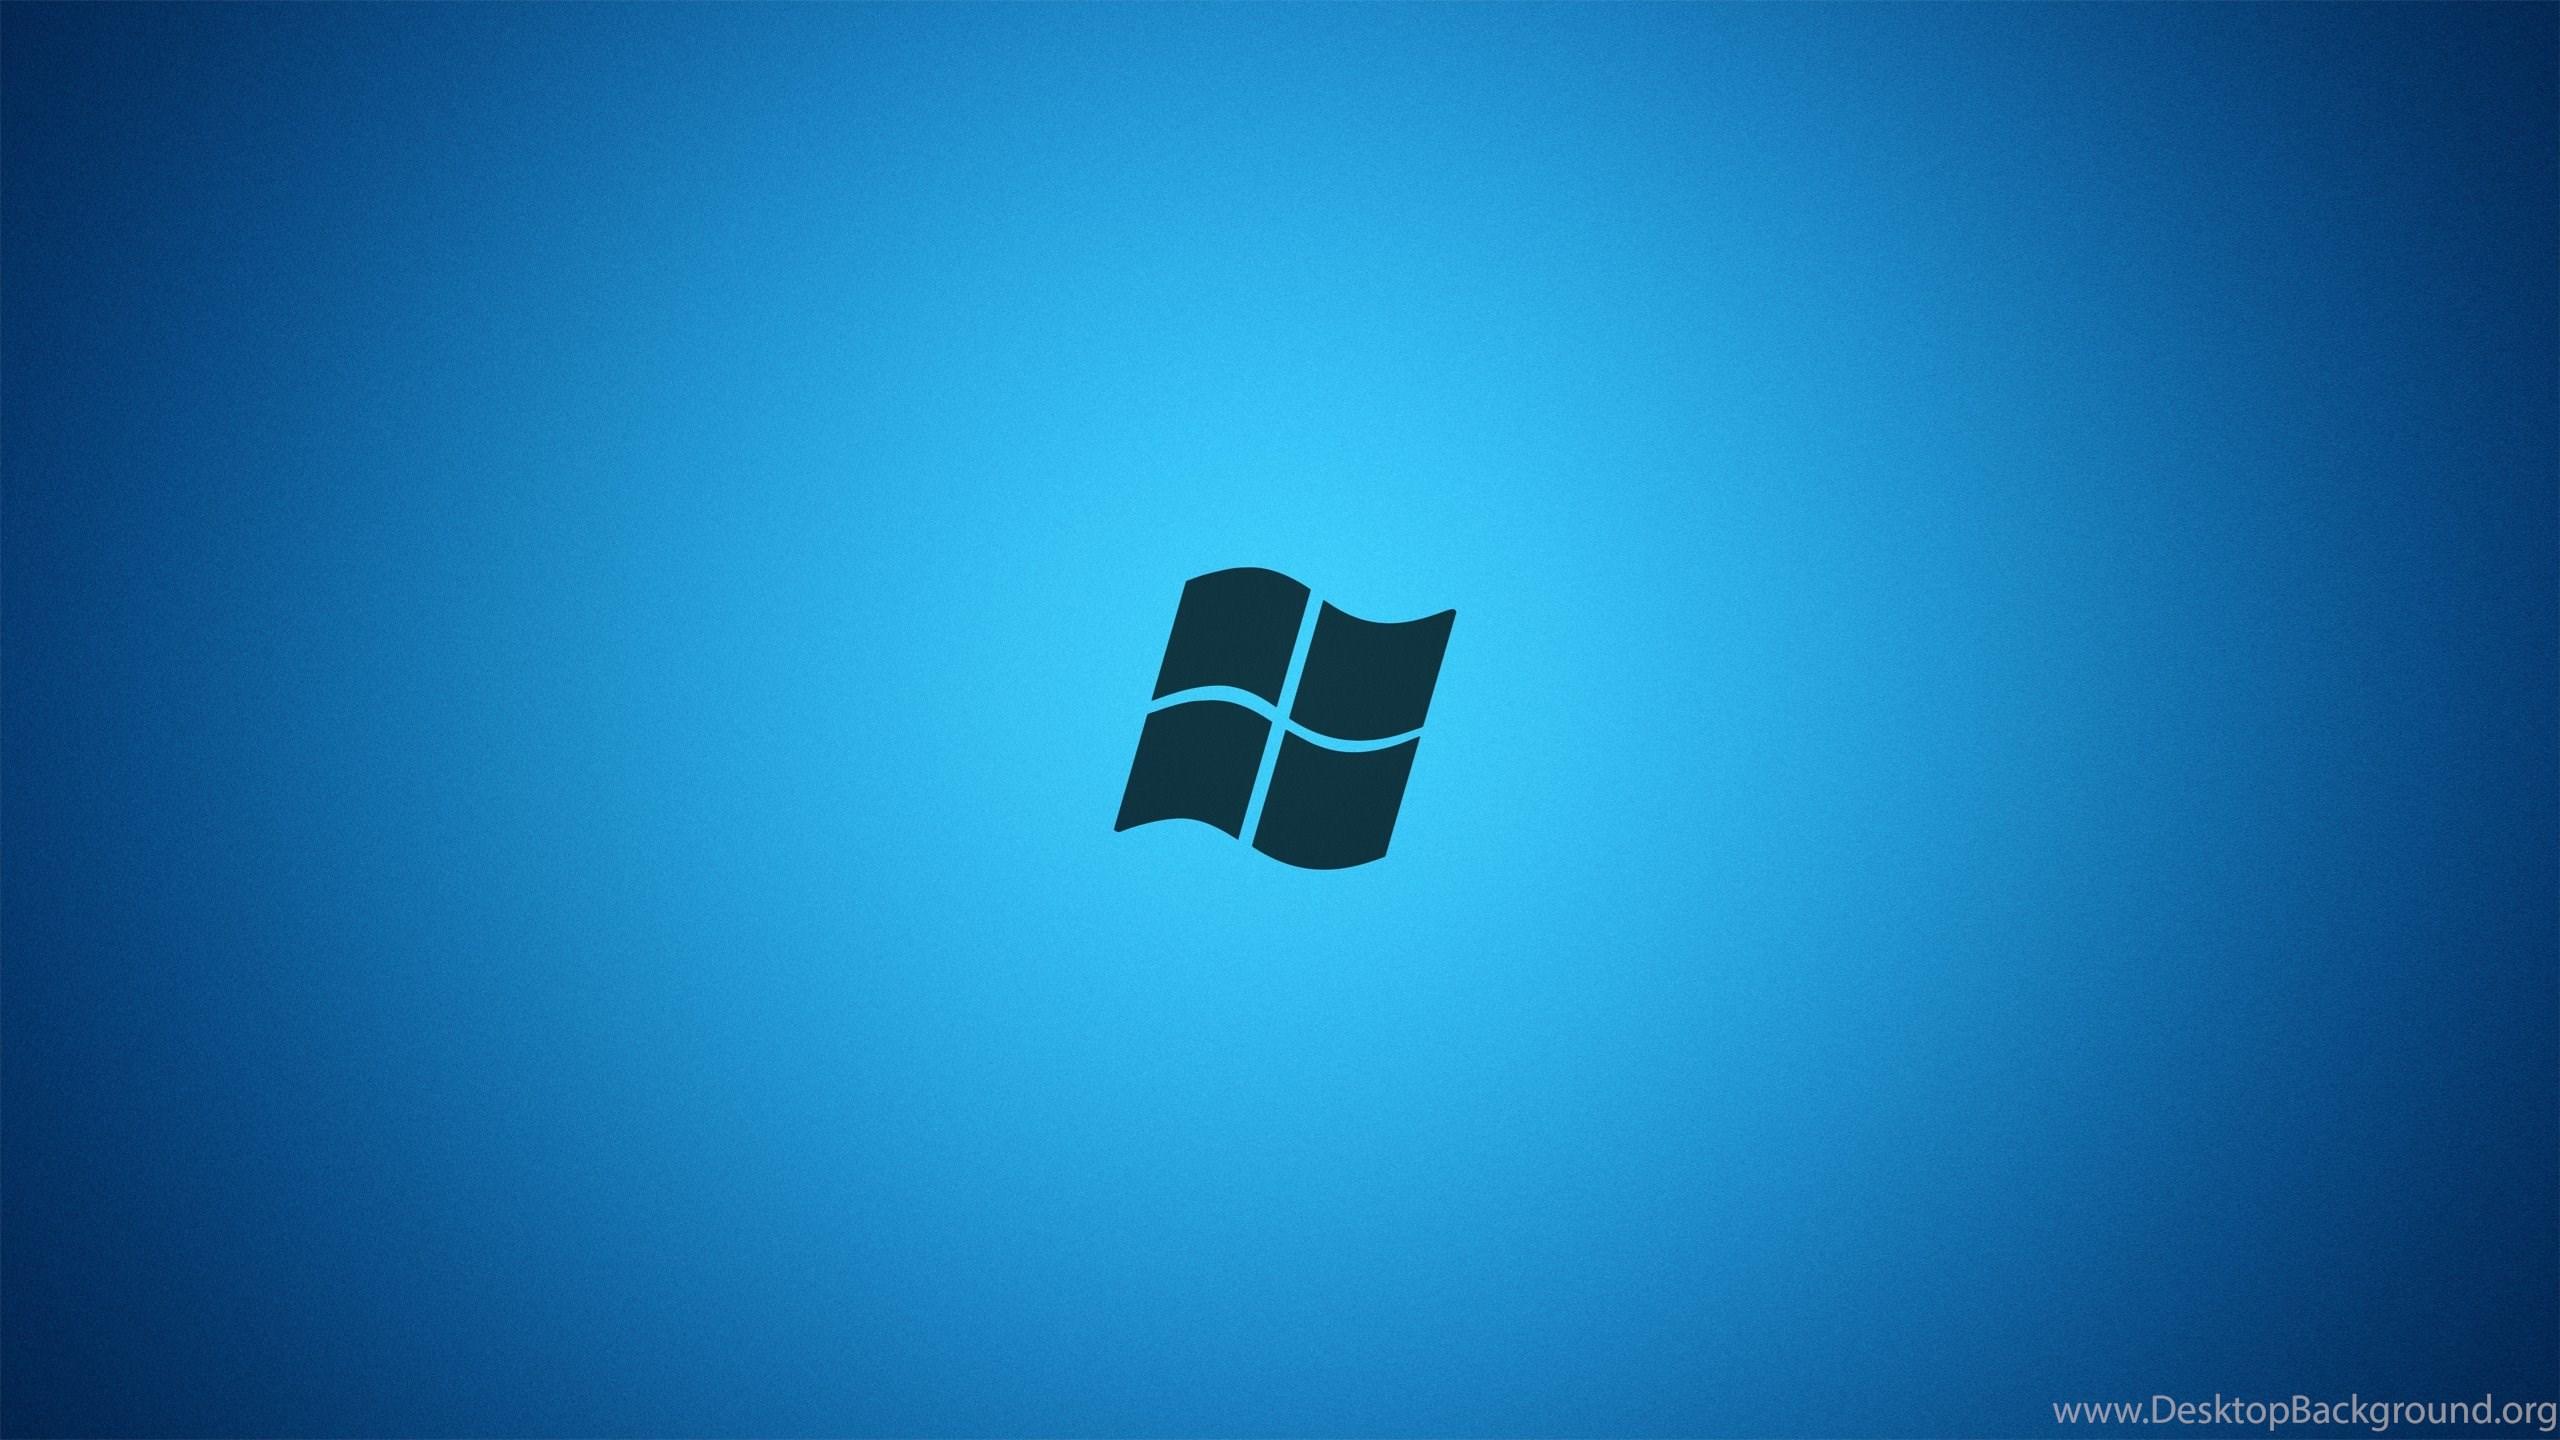 windows 7 logo on wood hd wallpaper backgrounds hd wallpapers